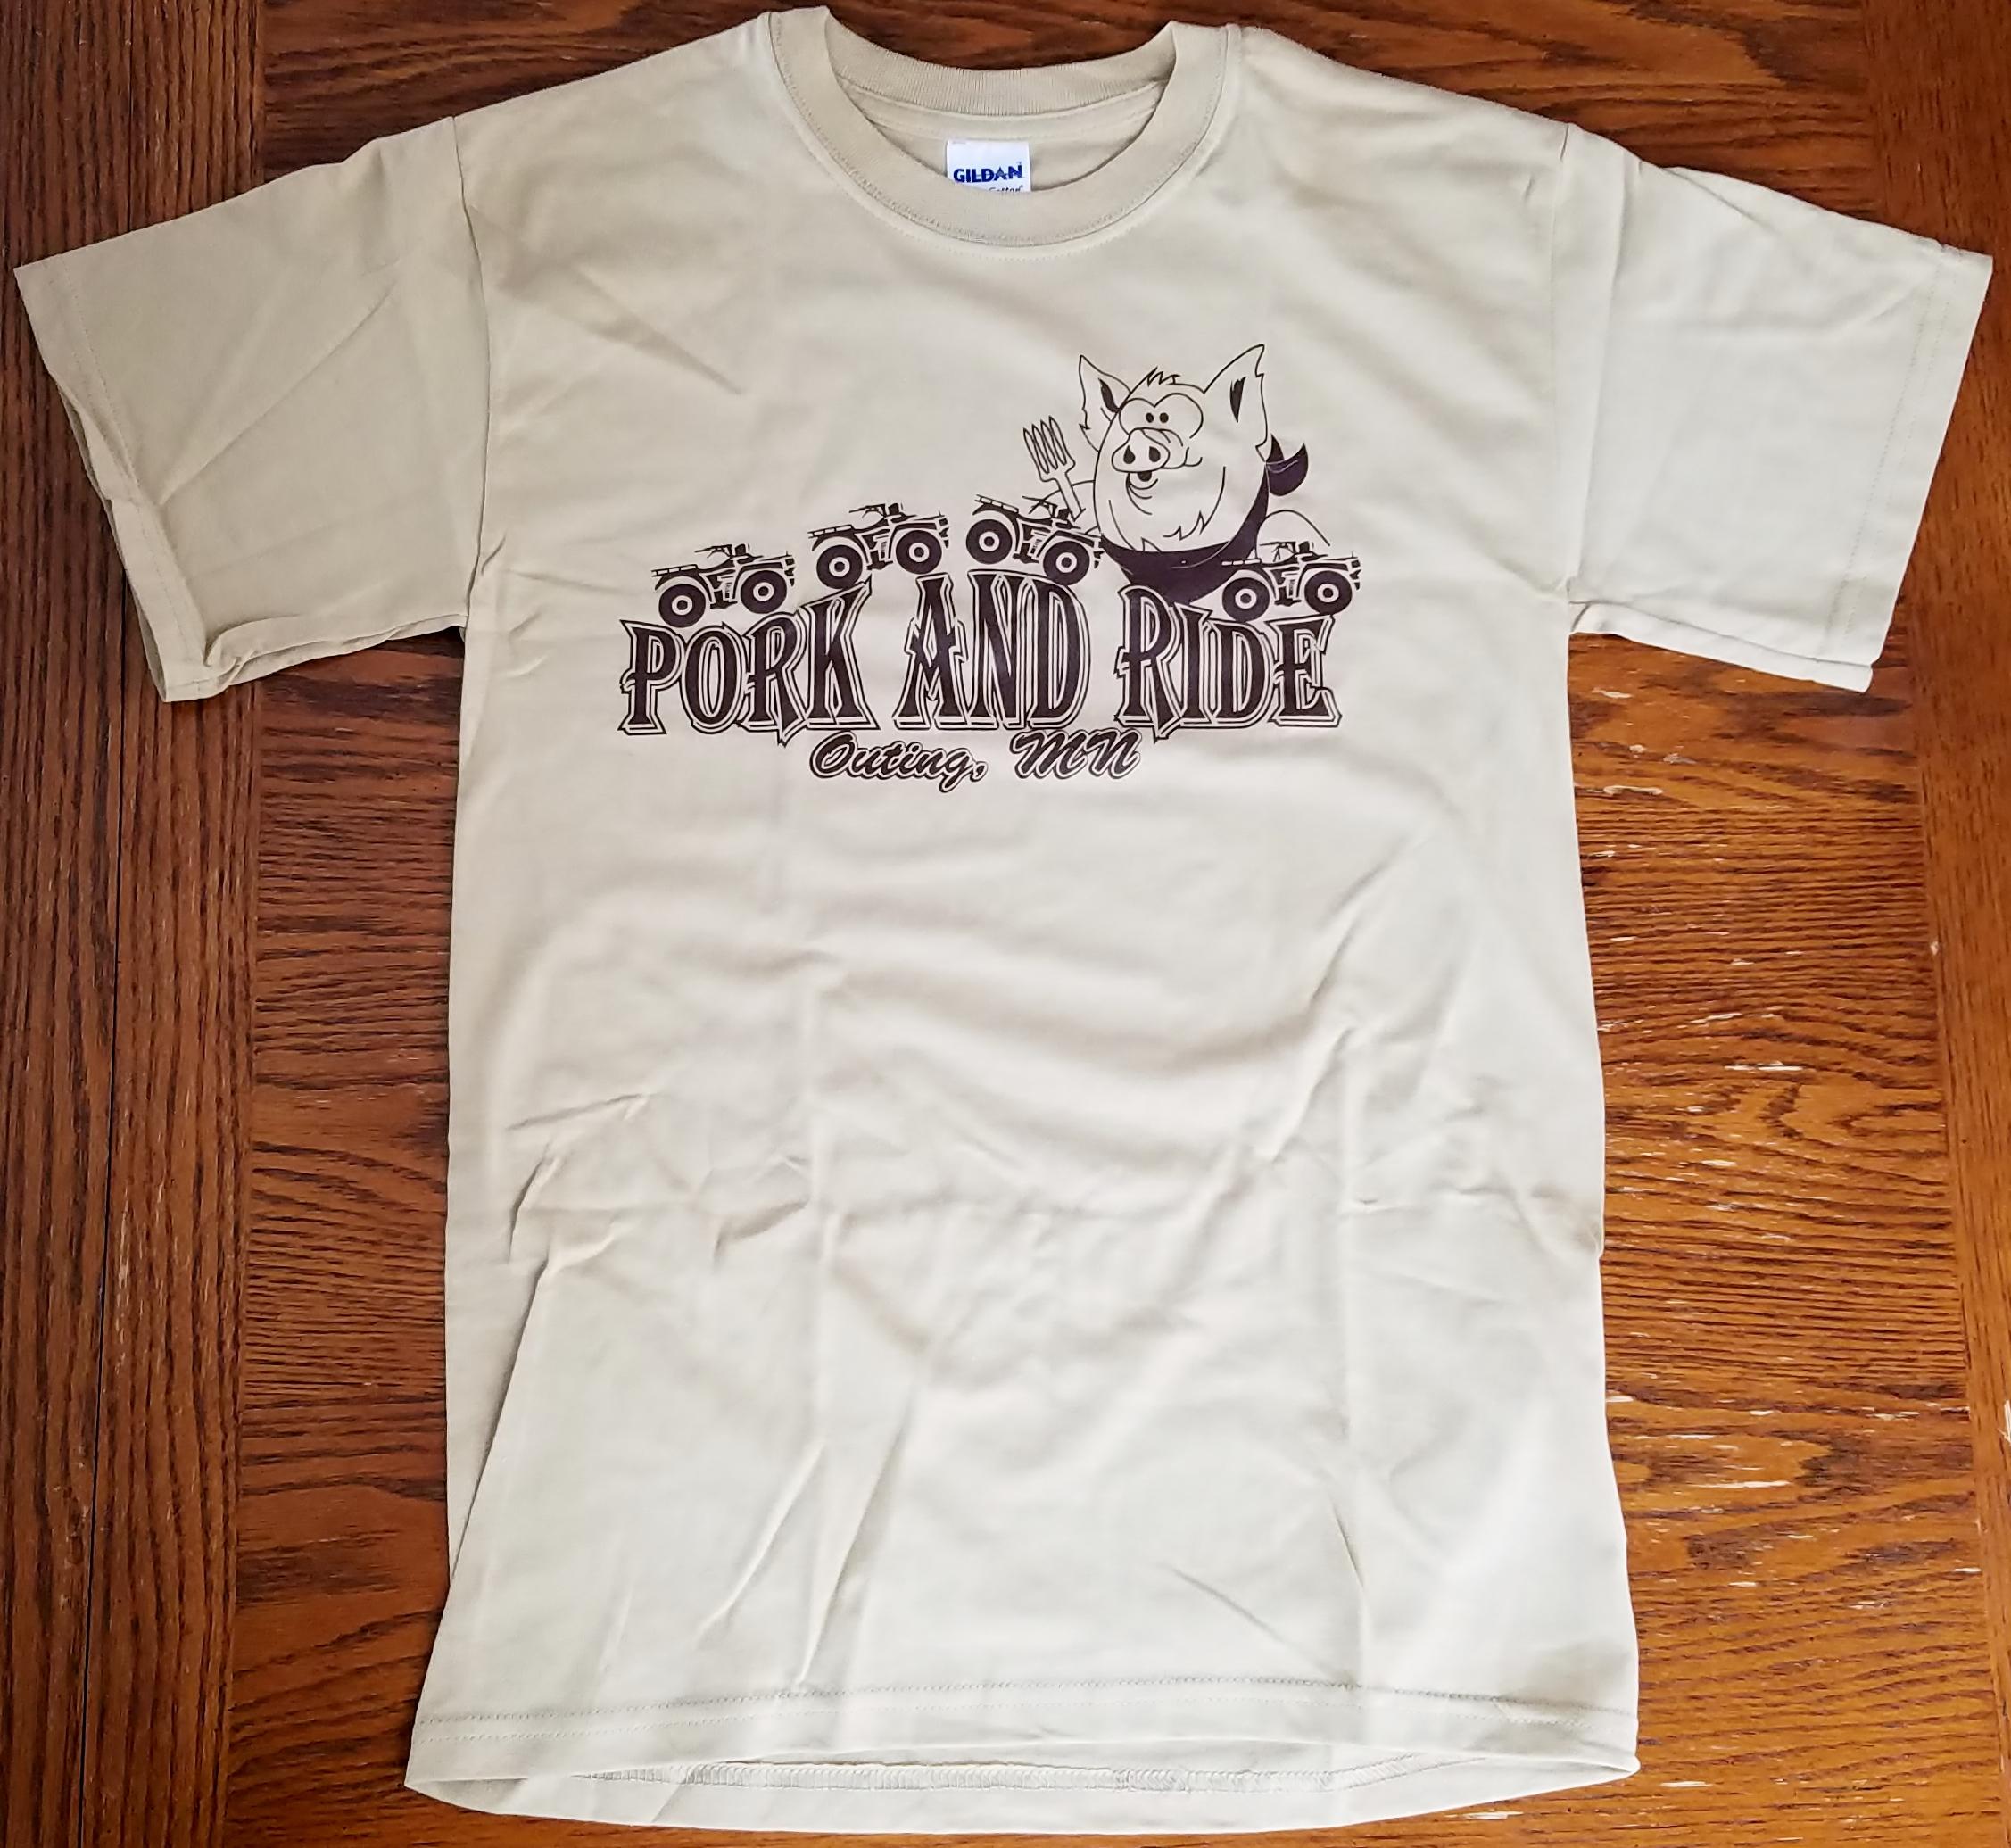 Pork-N-Ride Short Sleeve T-Shirts - Tan